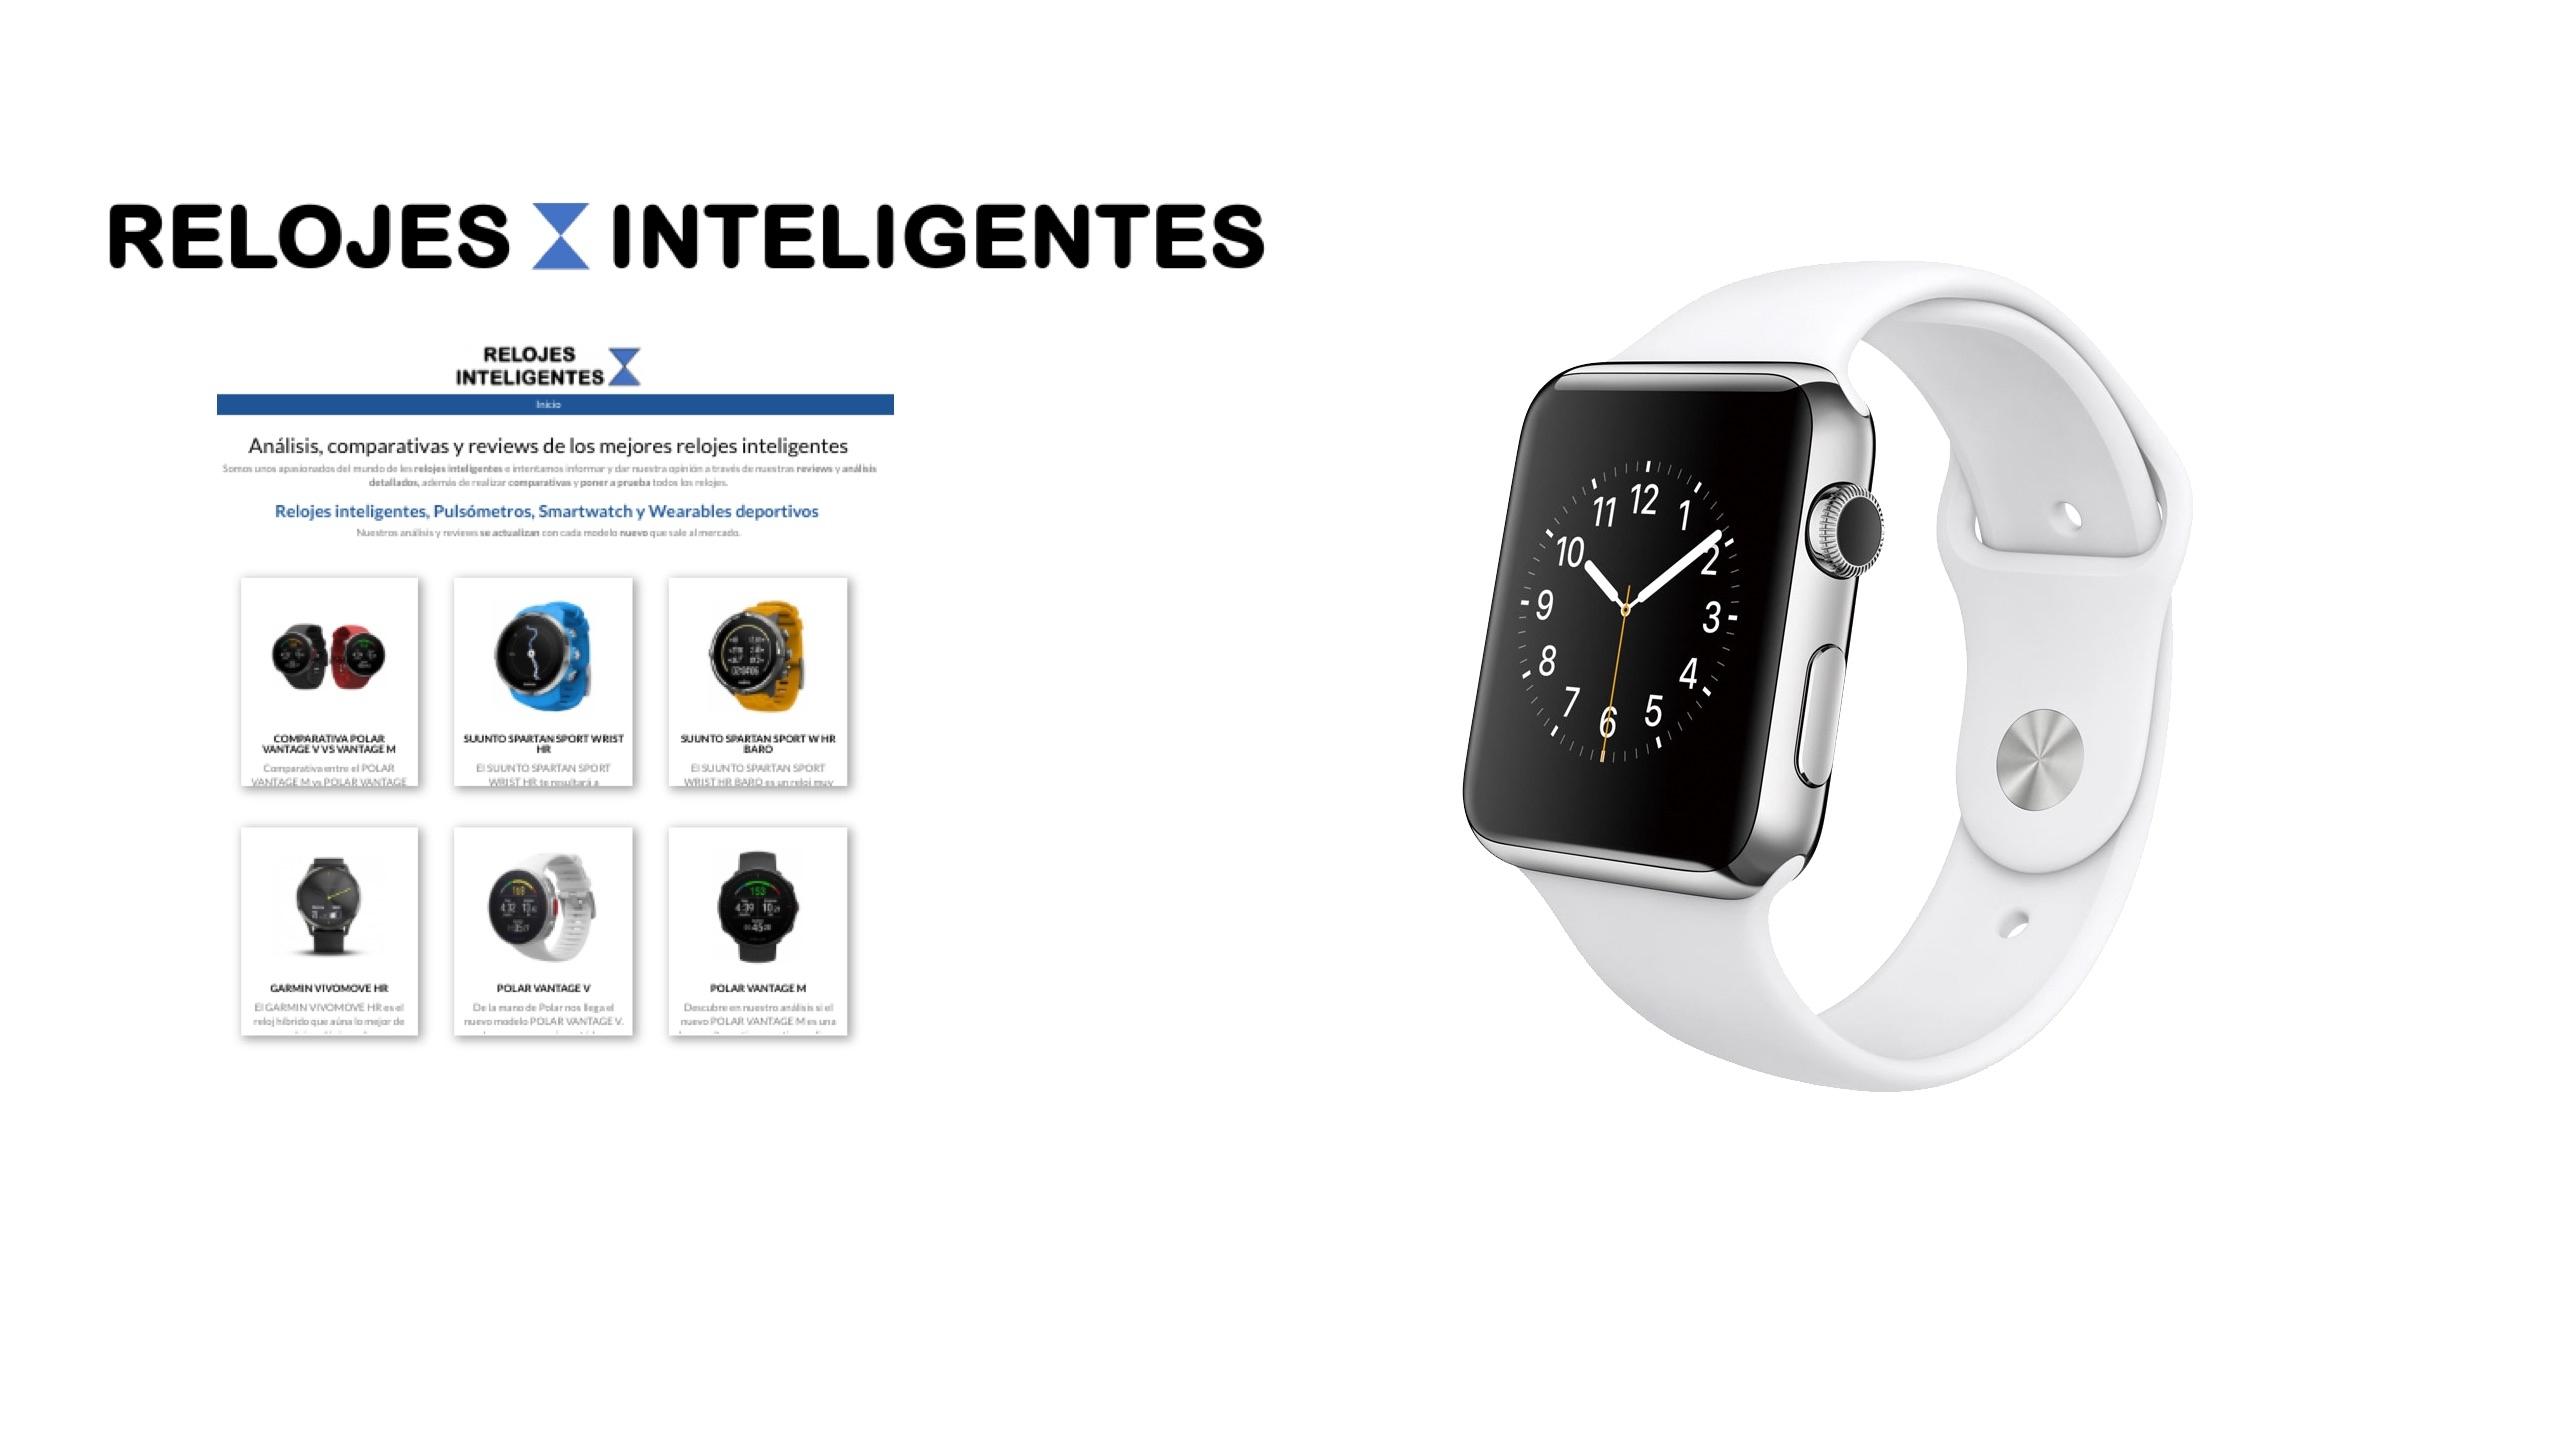 Relojesinteligentes.info (@relojesinteligentes) Cover Image